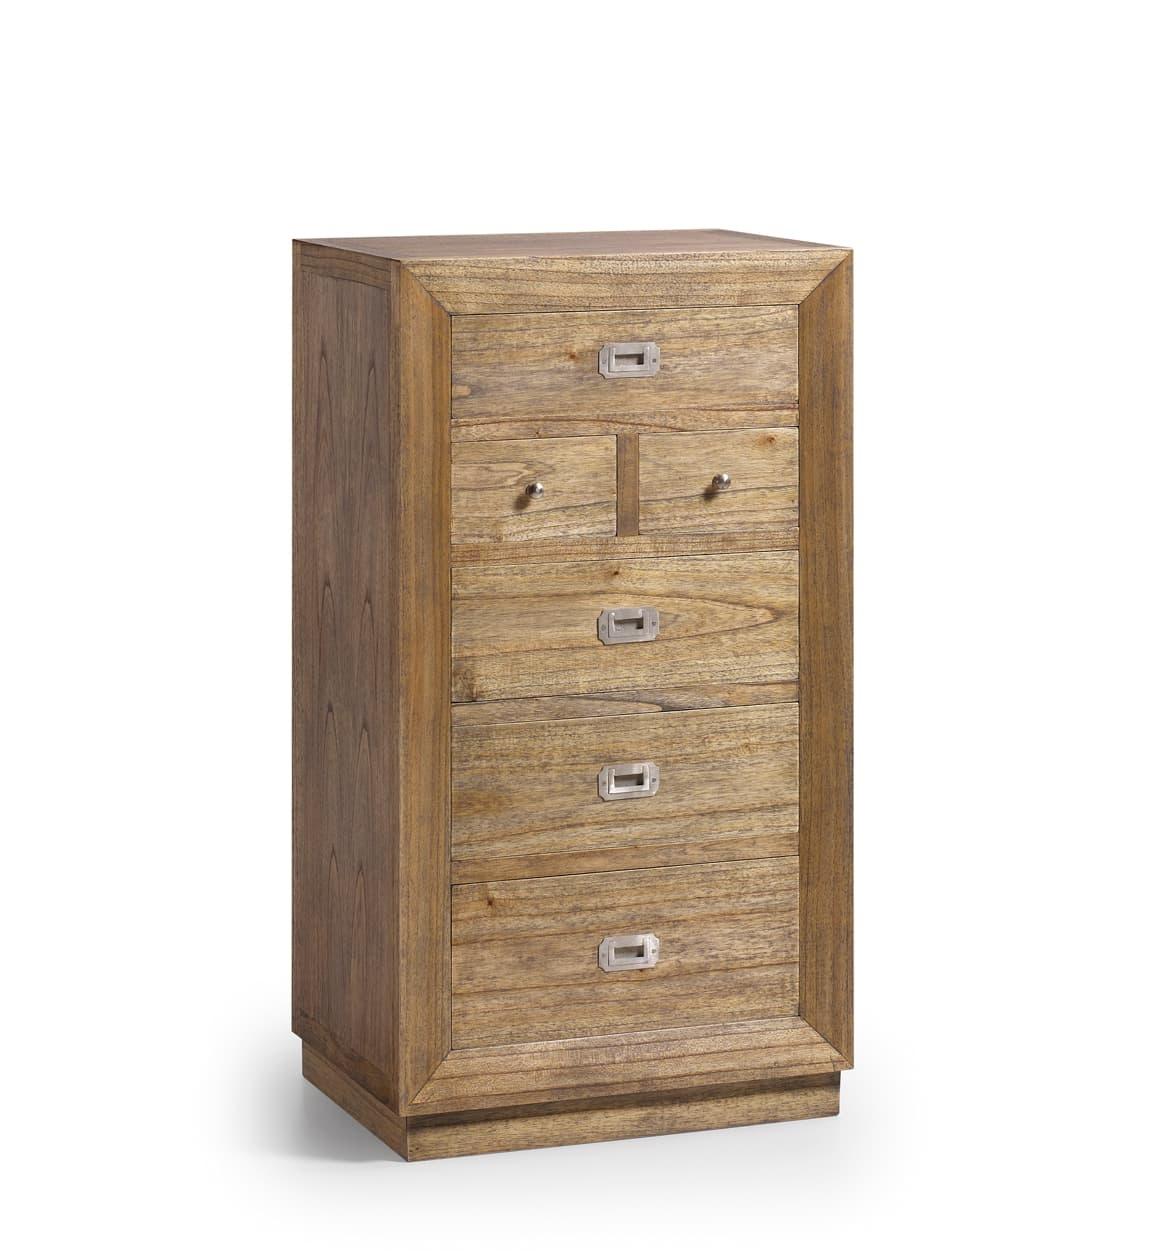 Cabinet din lemn cu 6 sertare, Merapi Natural, l60xA45xH110 cm somproduct.ro